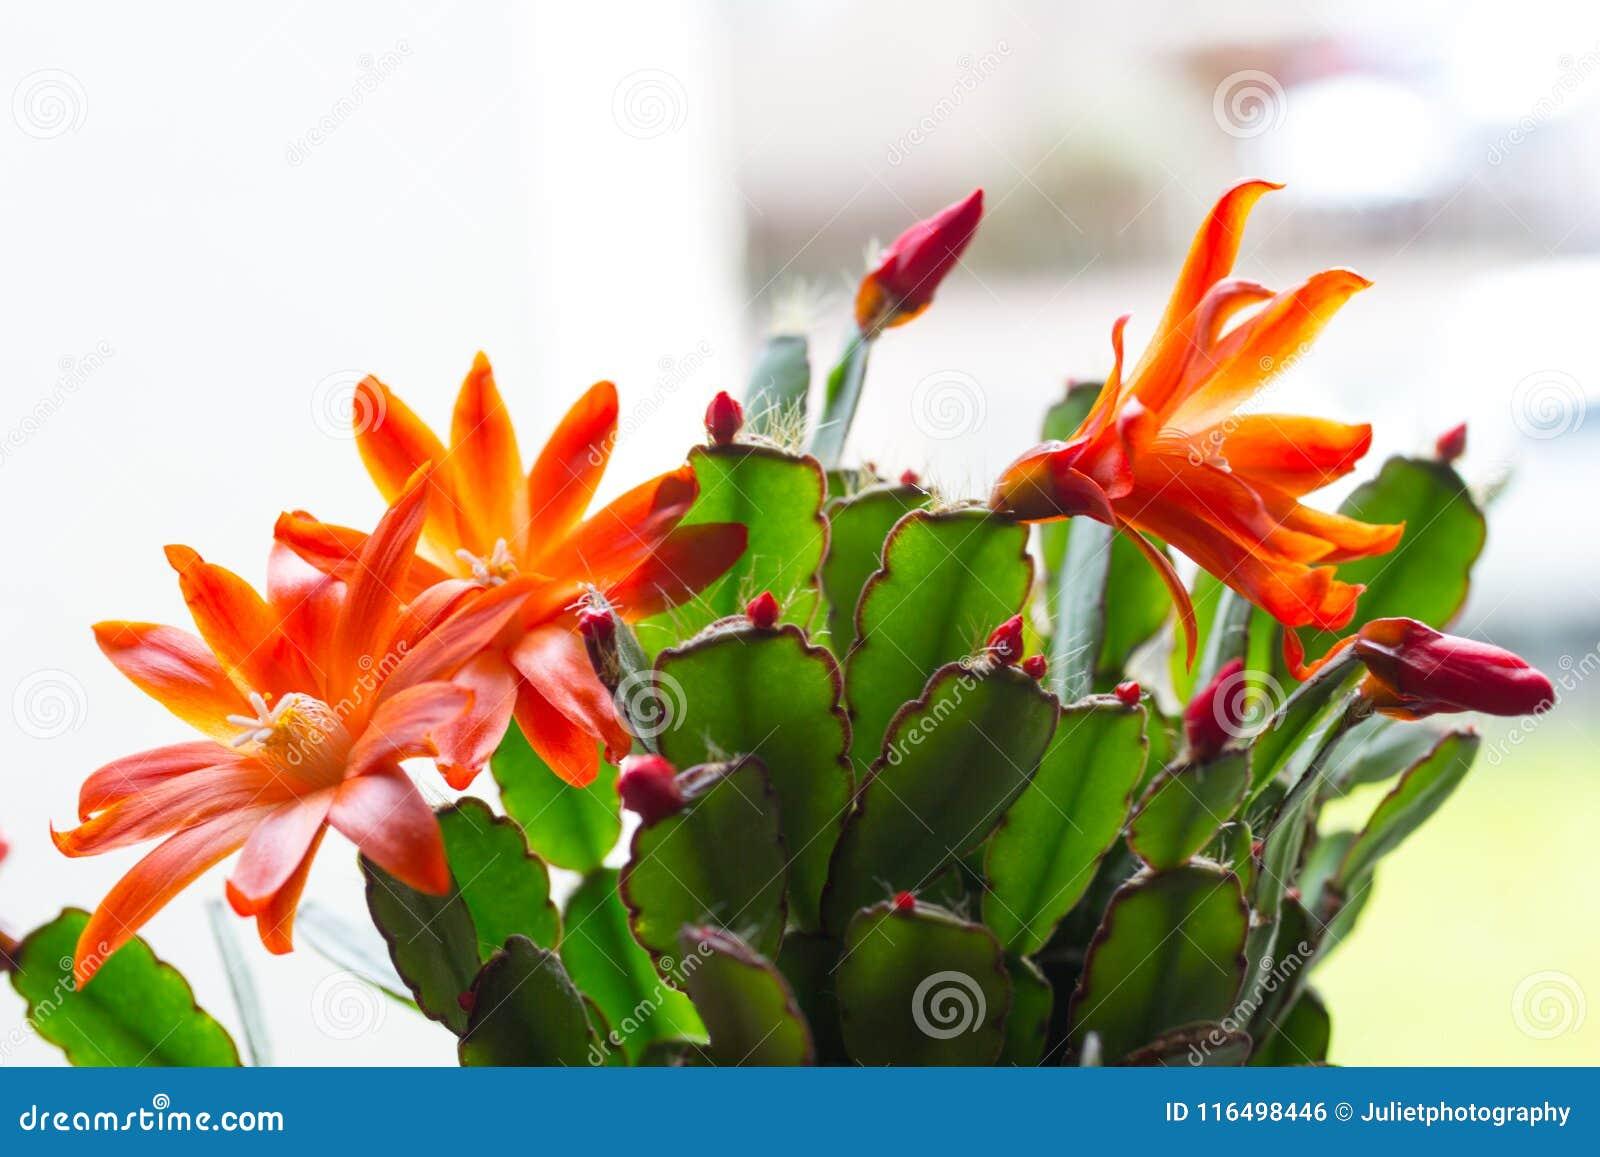 Trendy cactus on window sill, close up shot